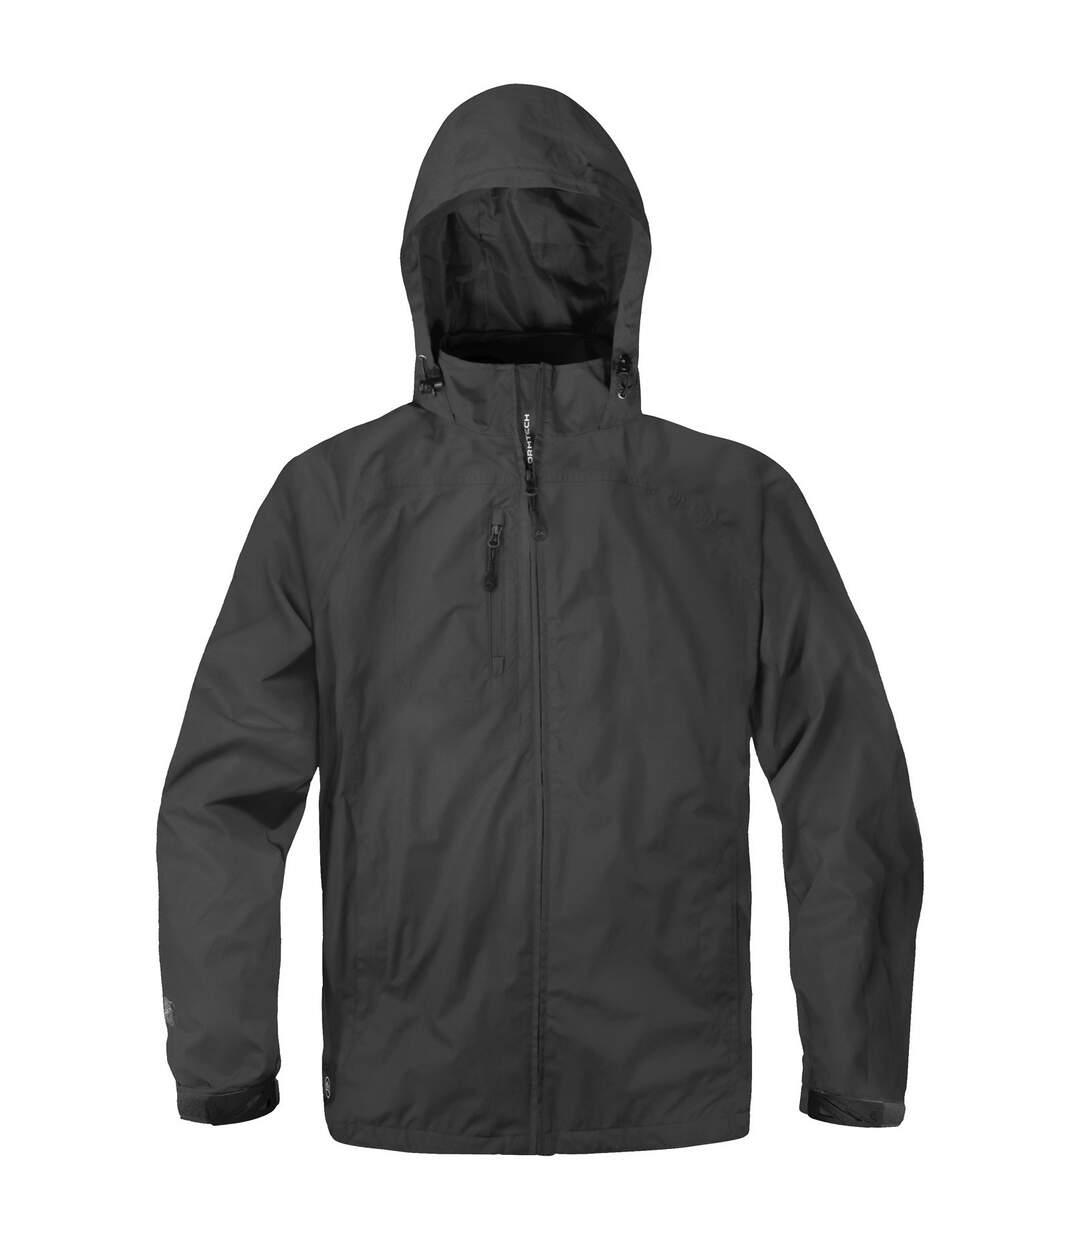 Stormtech Mens Stratus Light Shell Jacket (Waterproof & Breathable) (Sky Blue) - UTBC2082